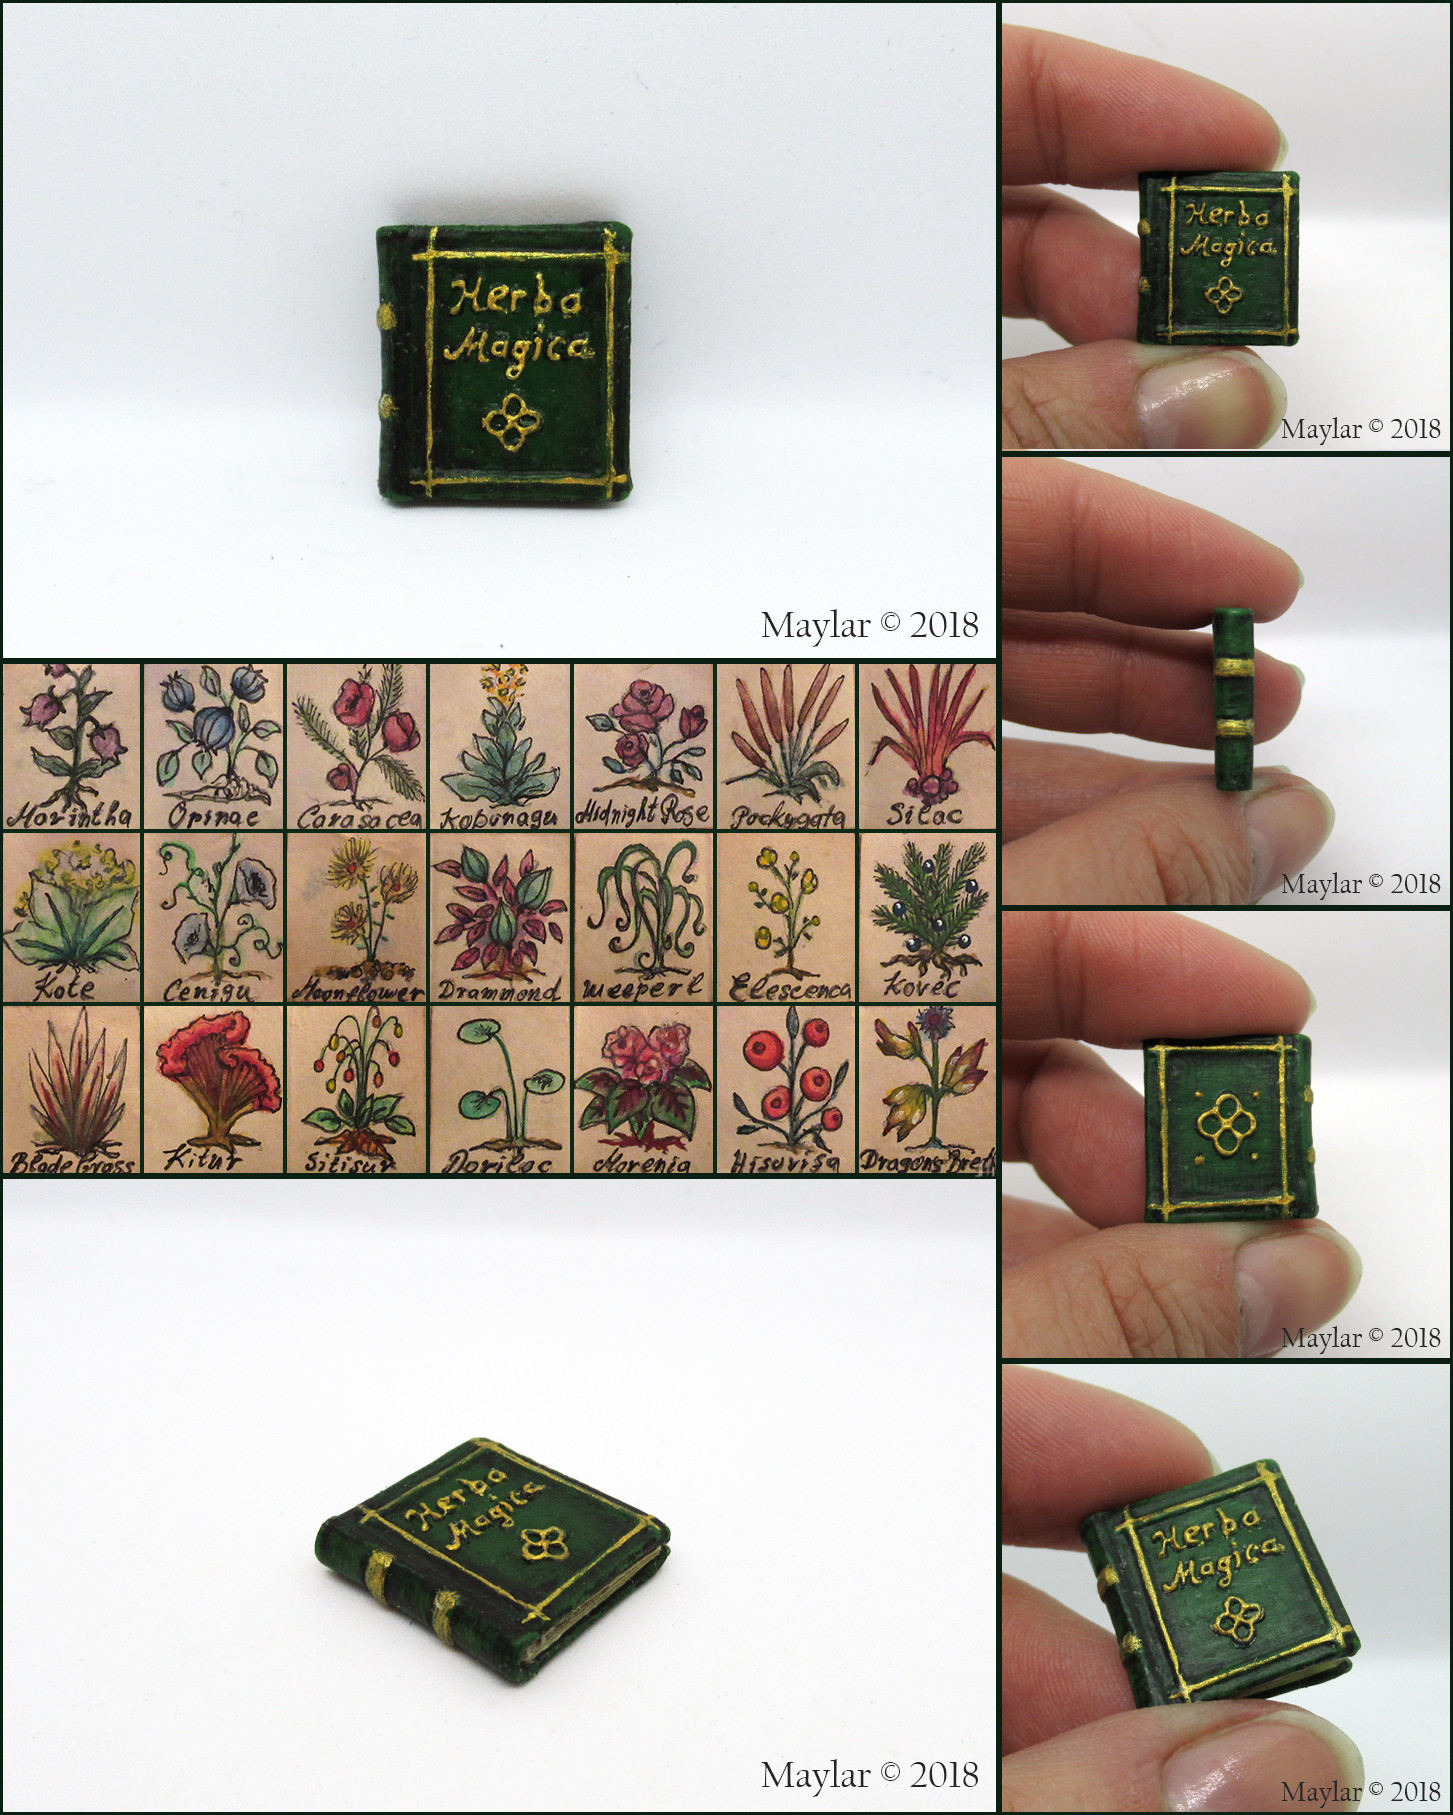 Herba Magica